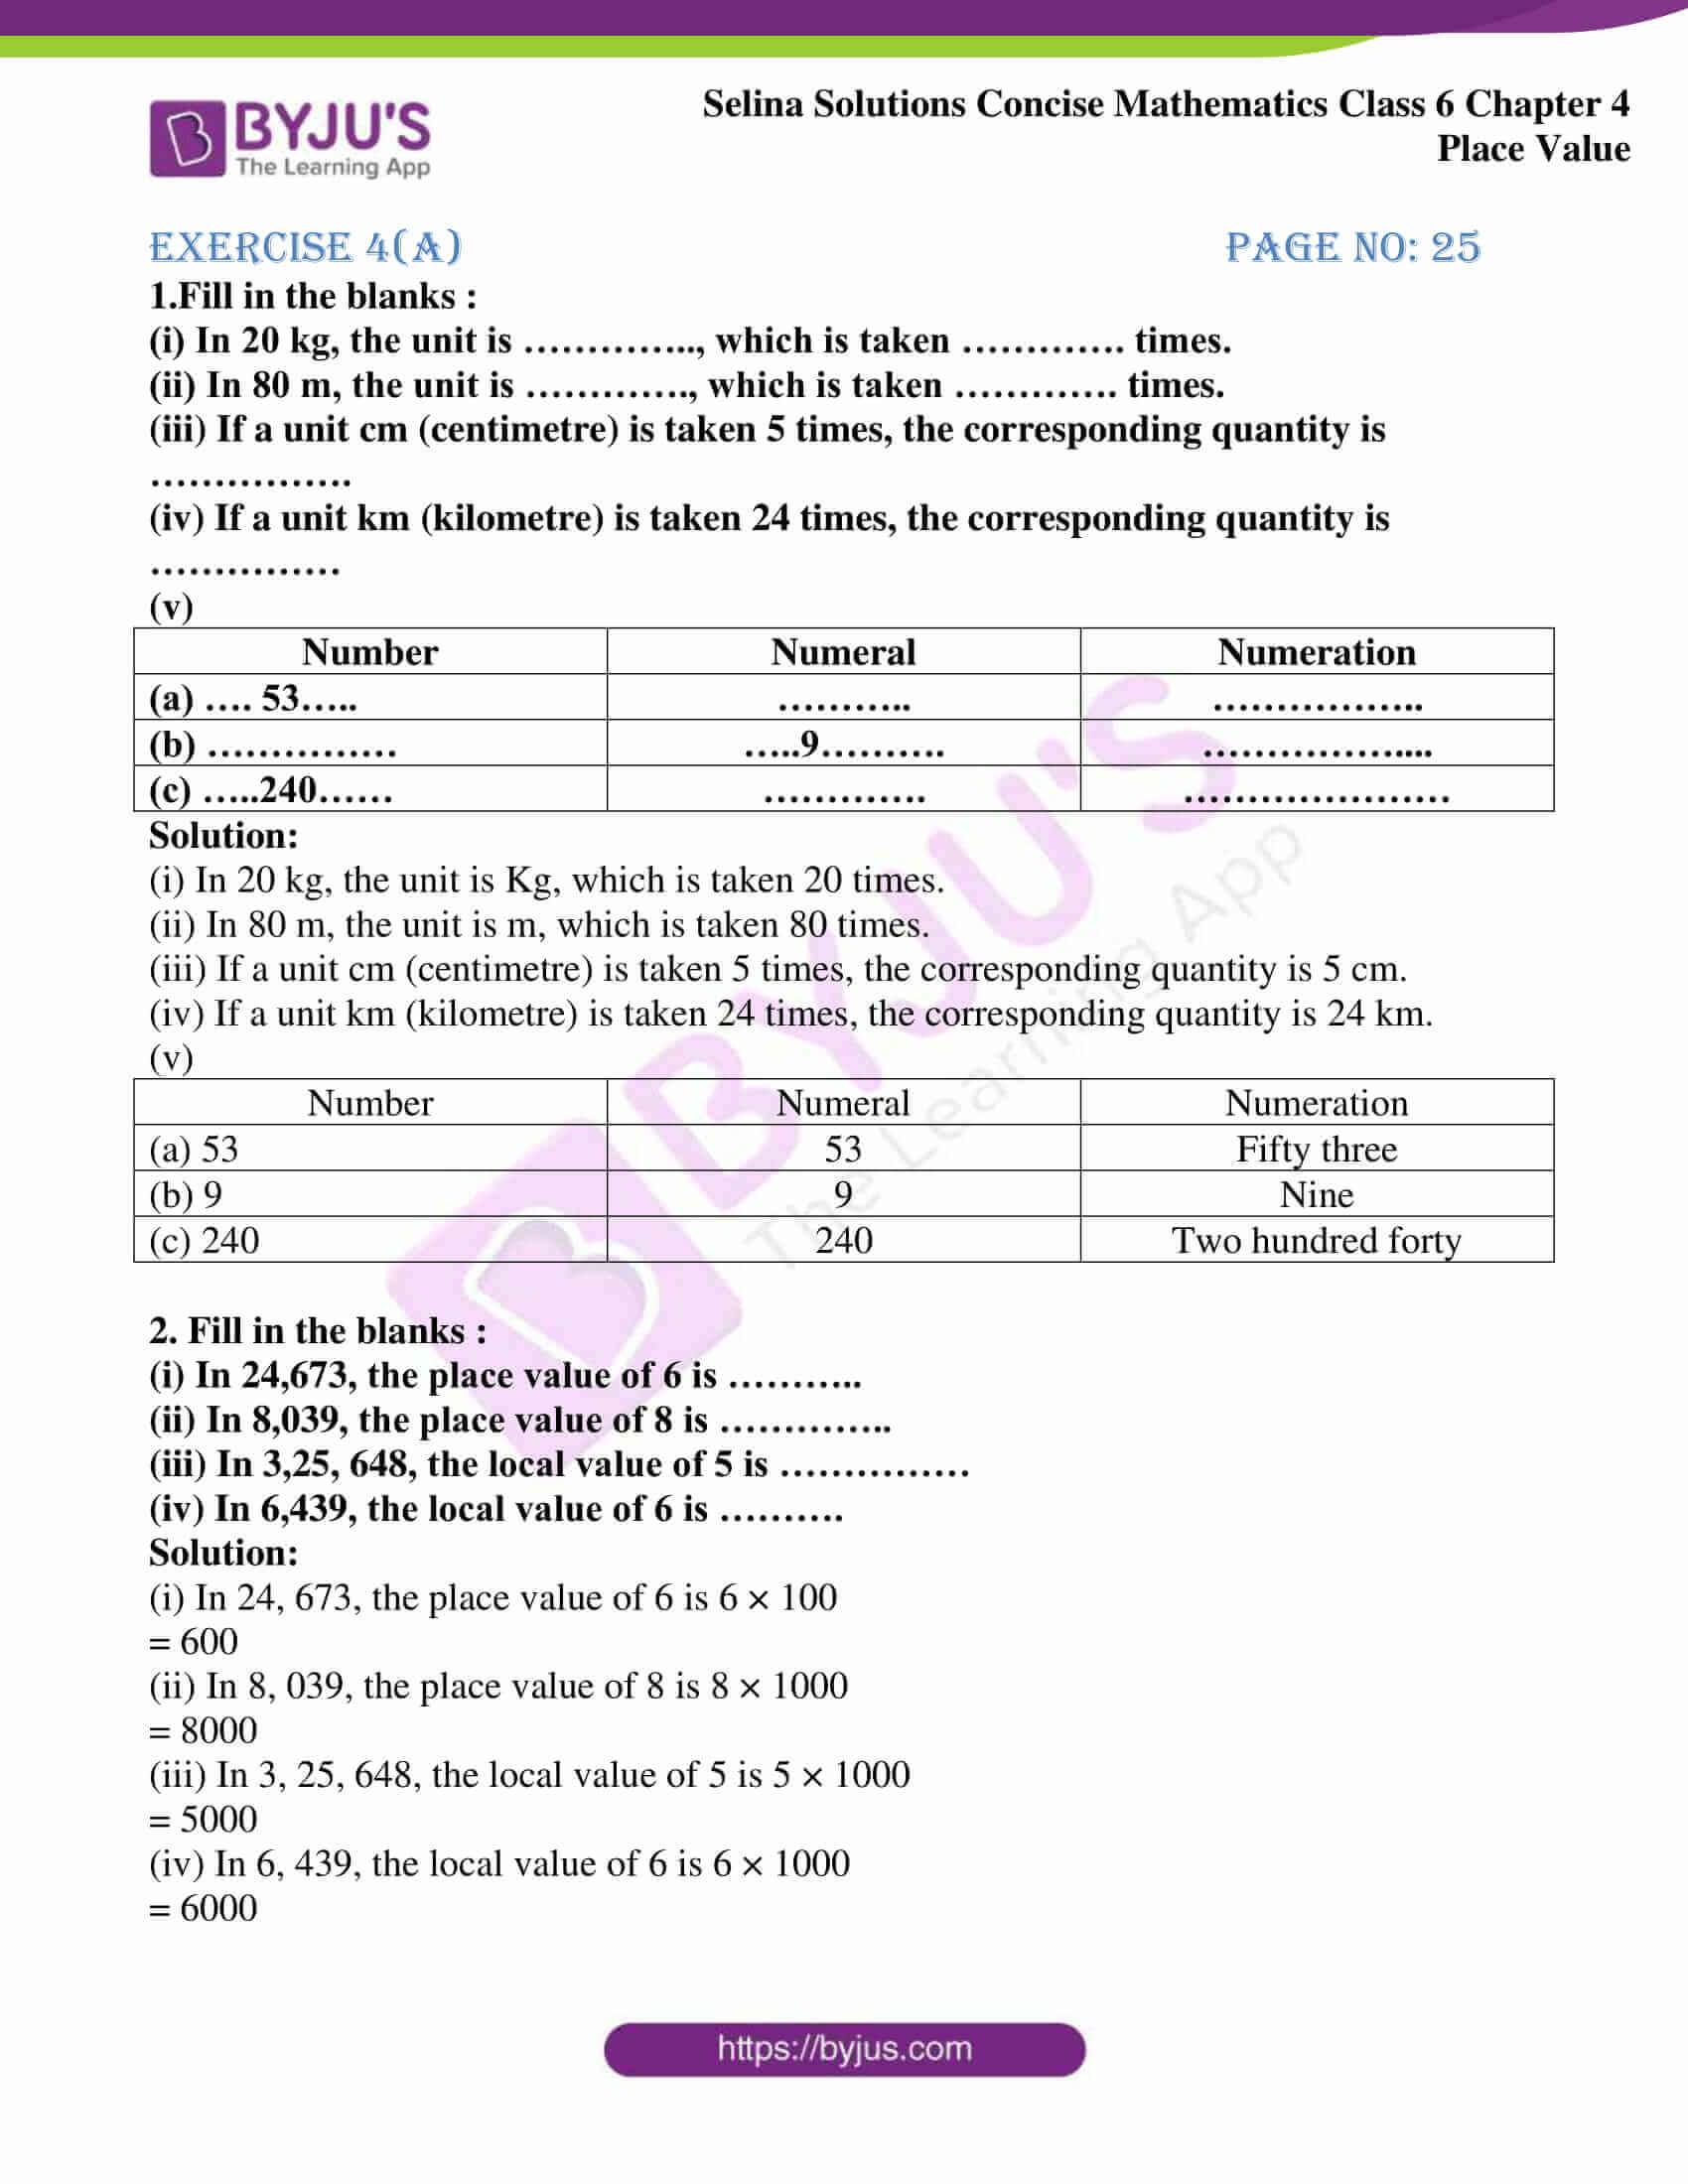 selina sol concise maths class 6 ch4 ex 4a 1